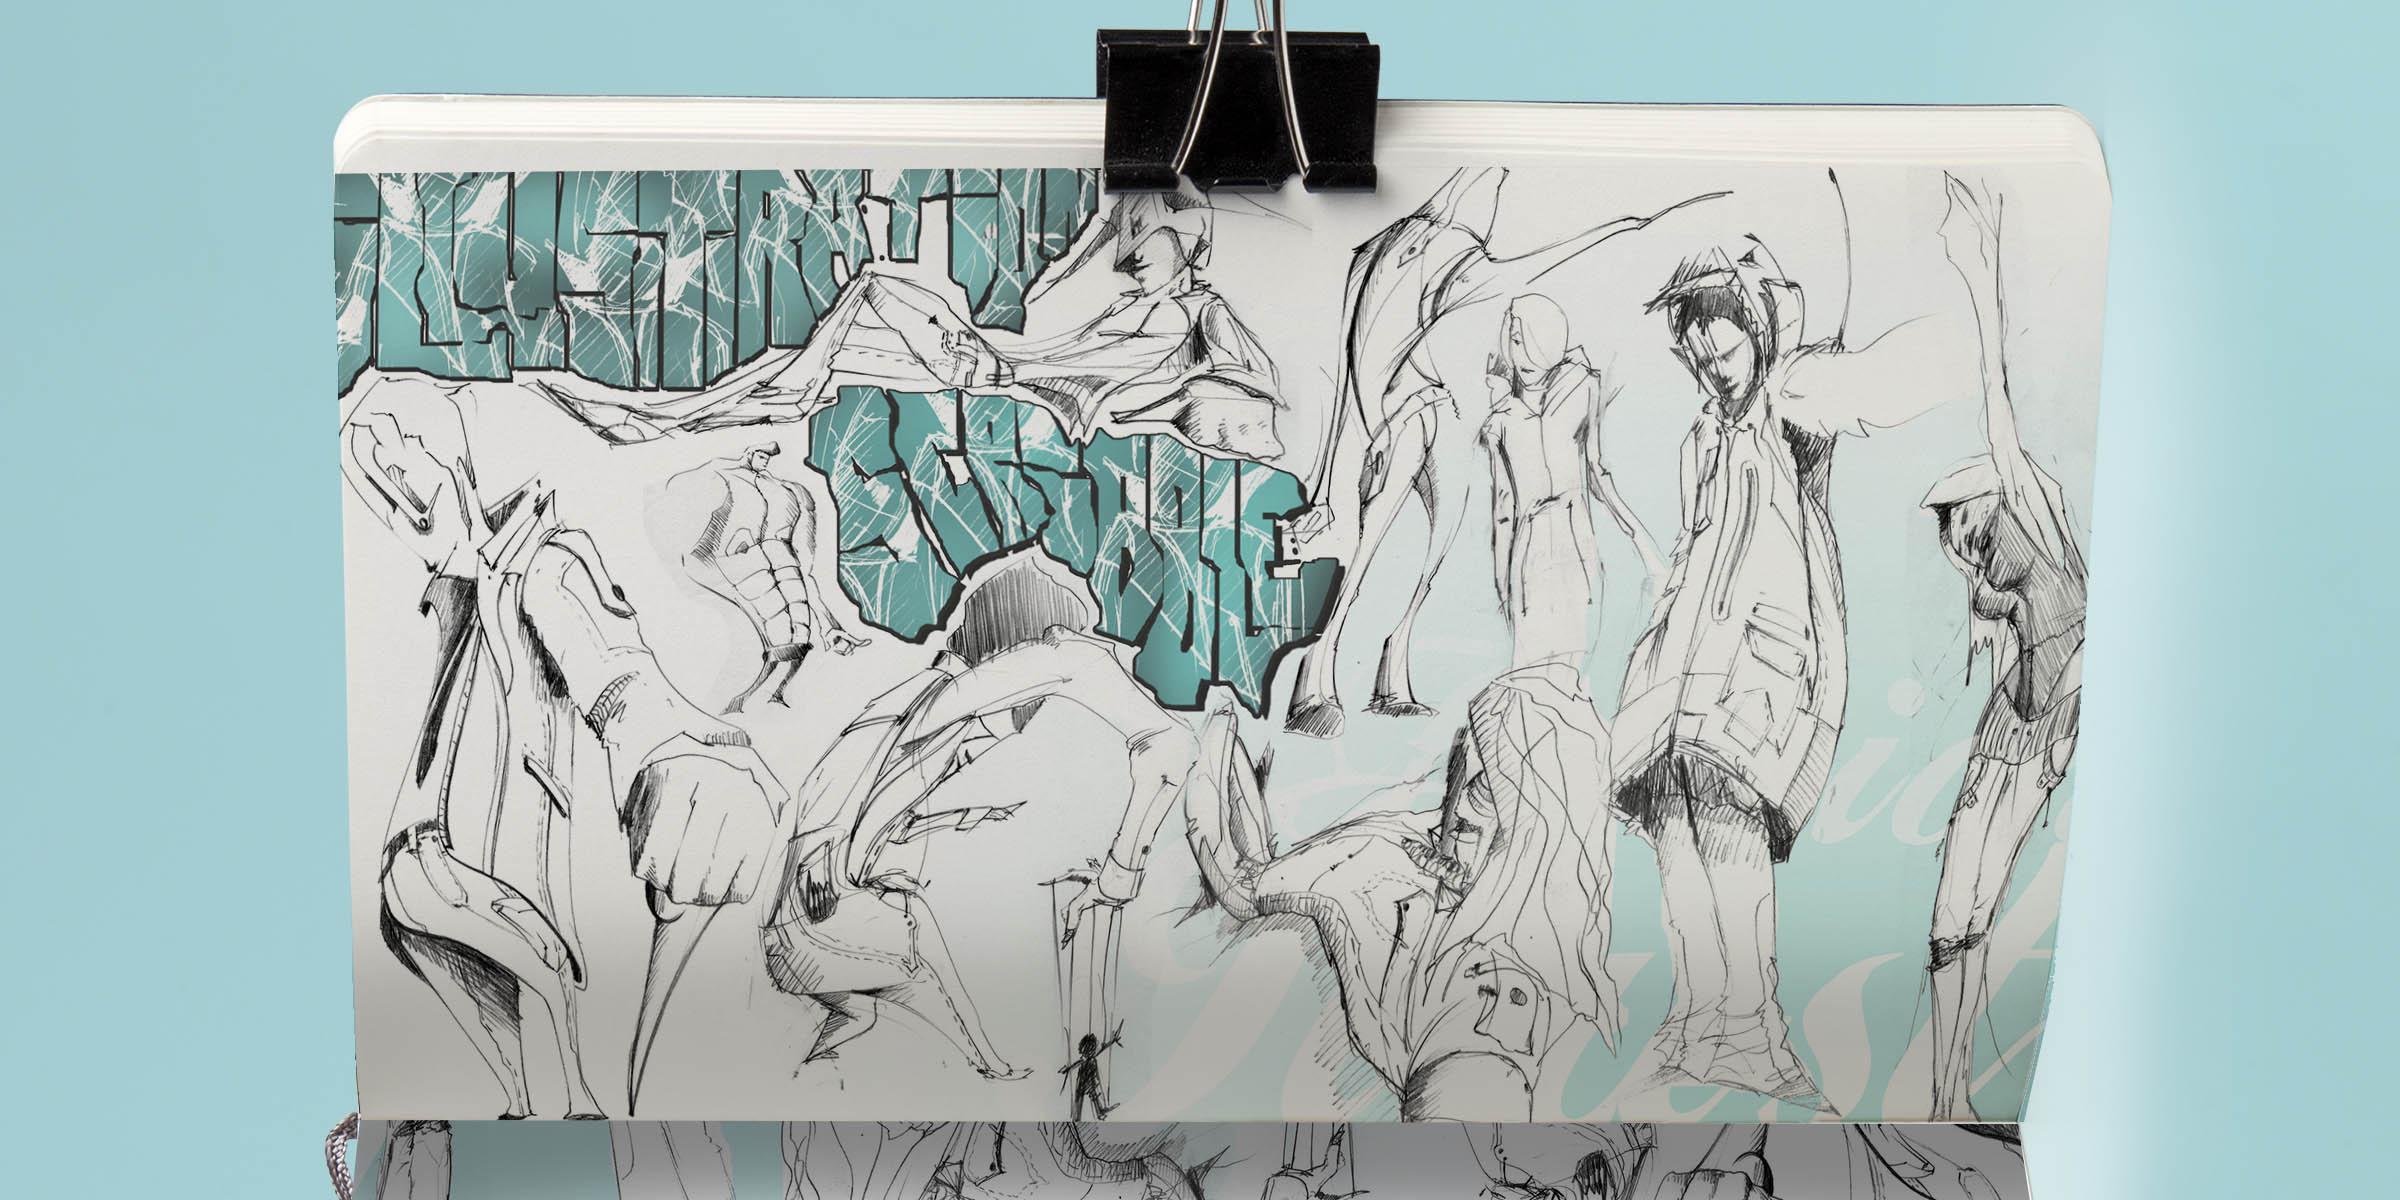 2 art artist street art illustrator gregor fenger gregor fenger art street acryl jakarta fair scribble graffiti